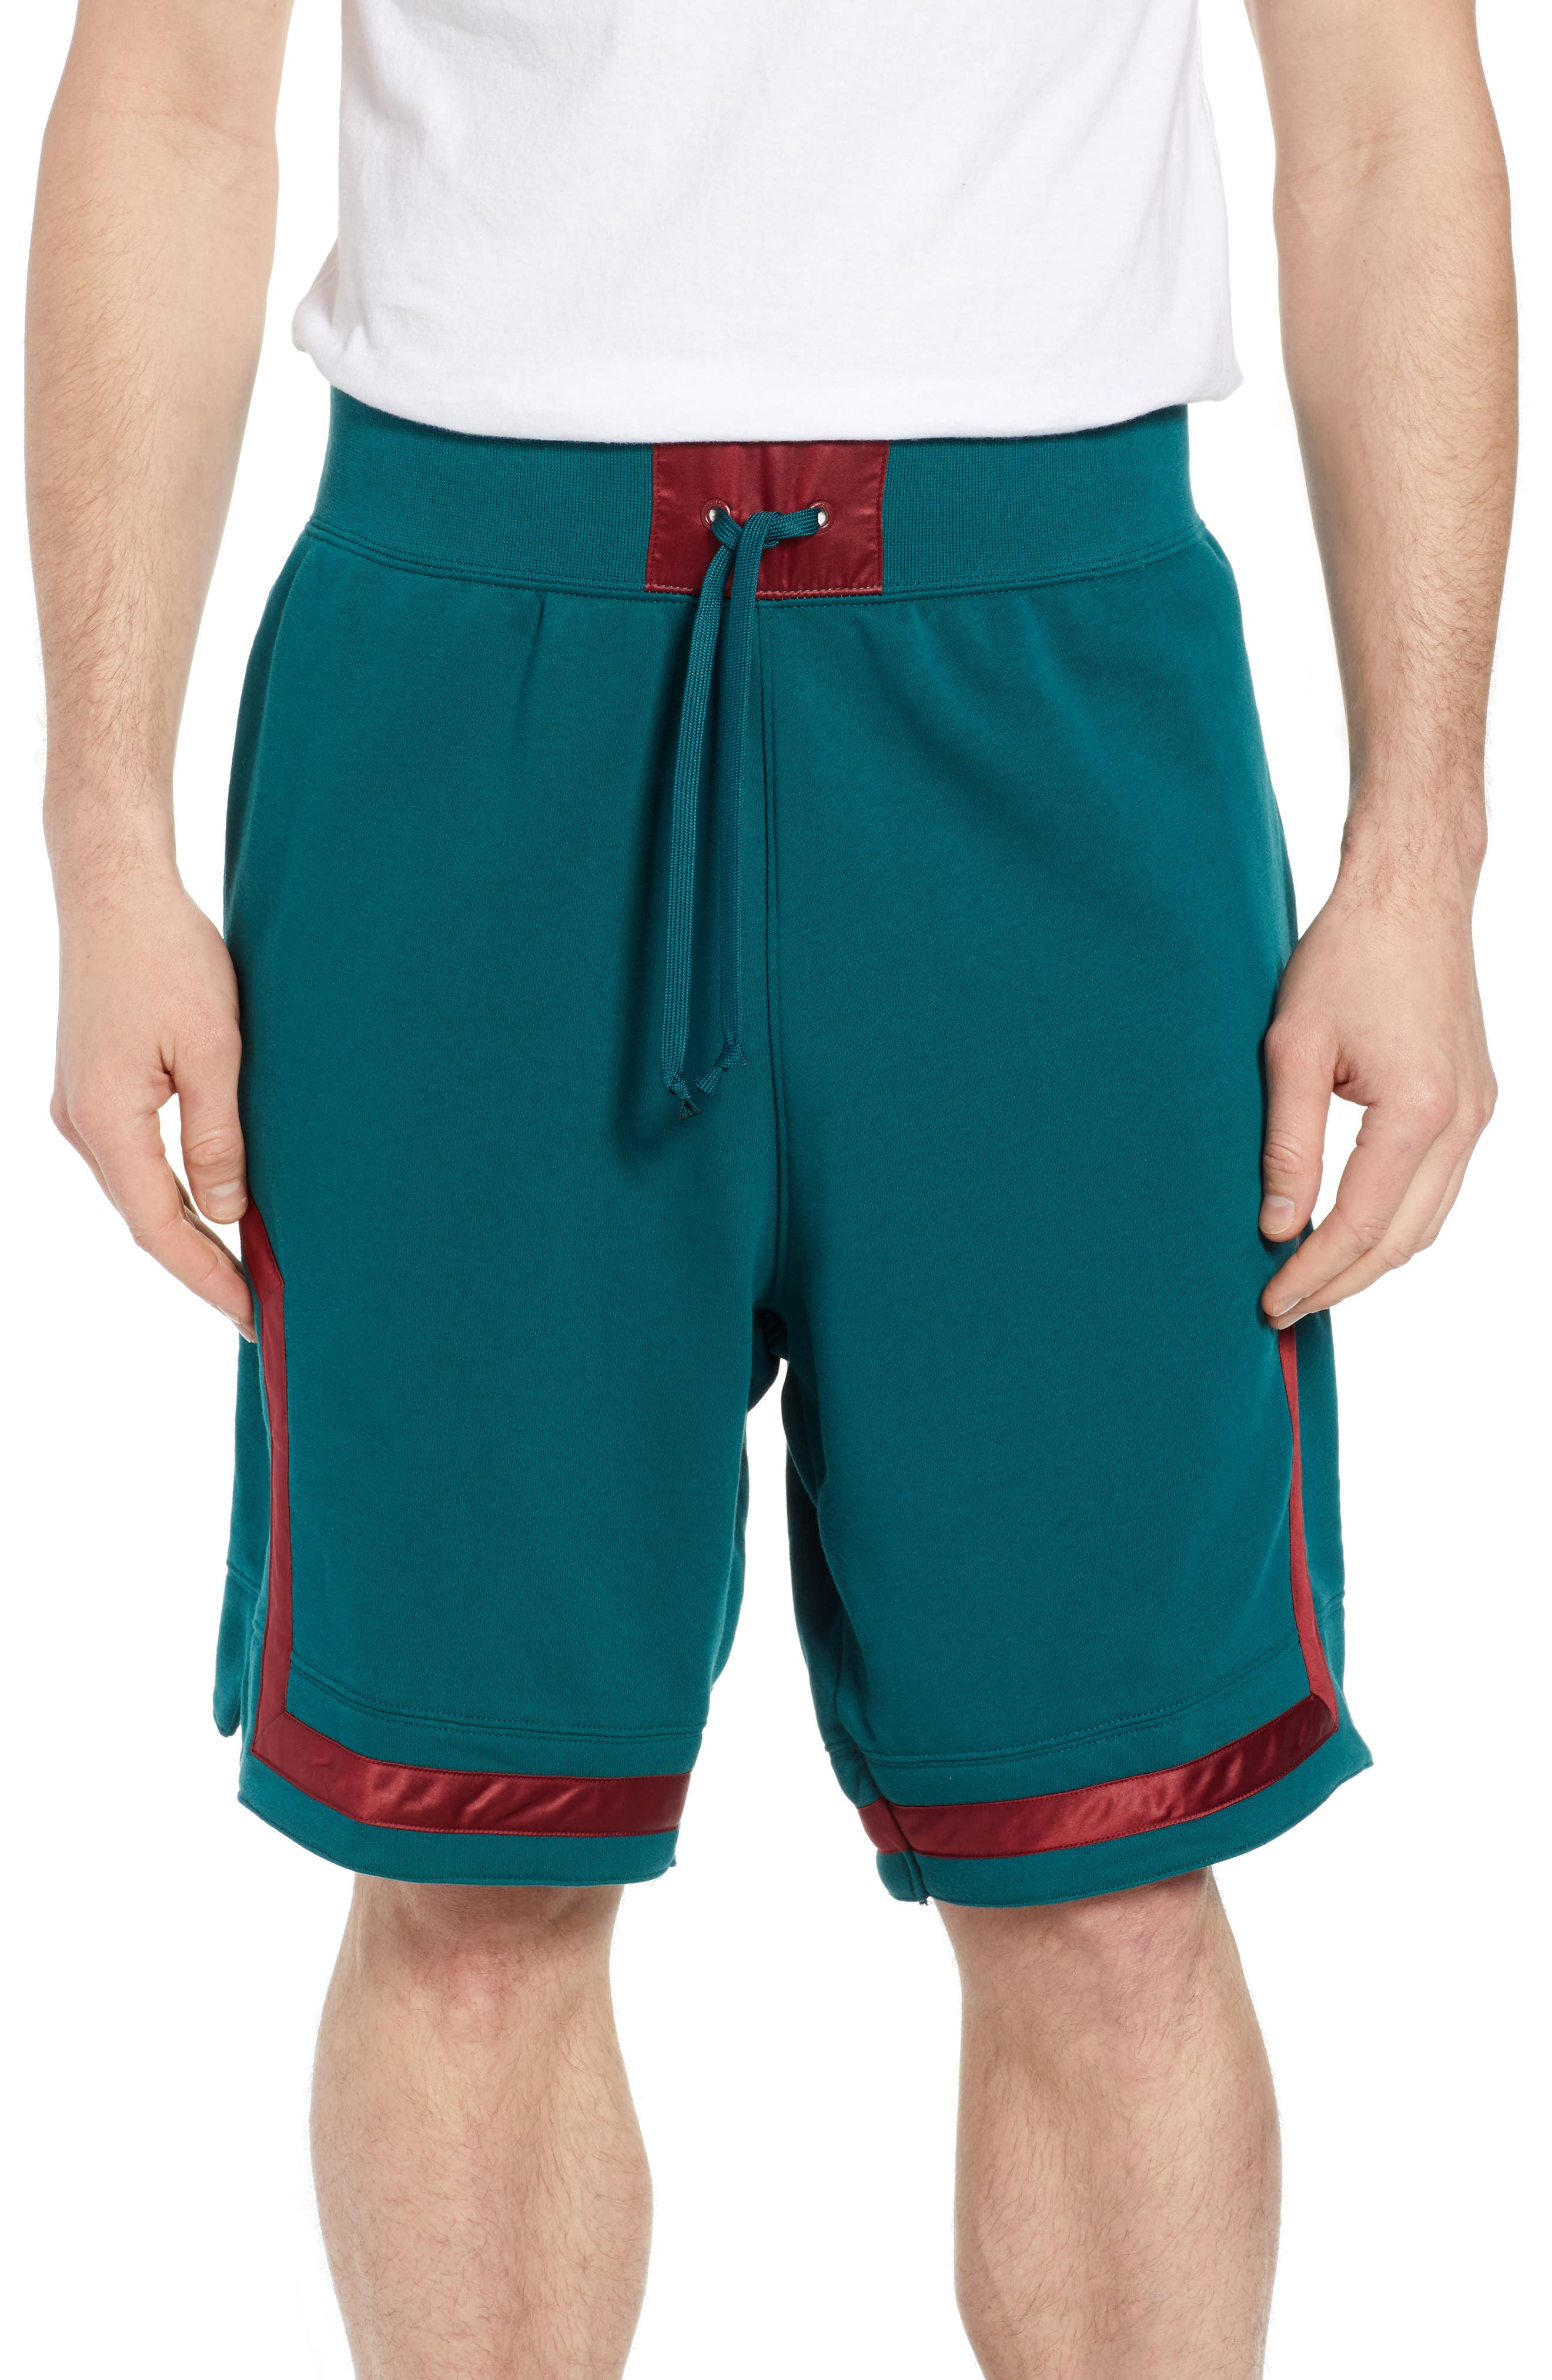 Nike Air Force One Shorts, Green